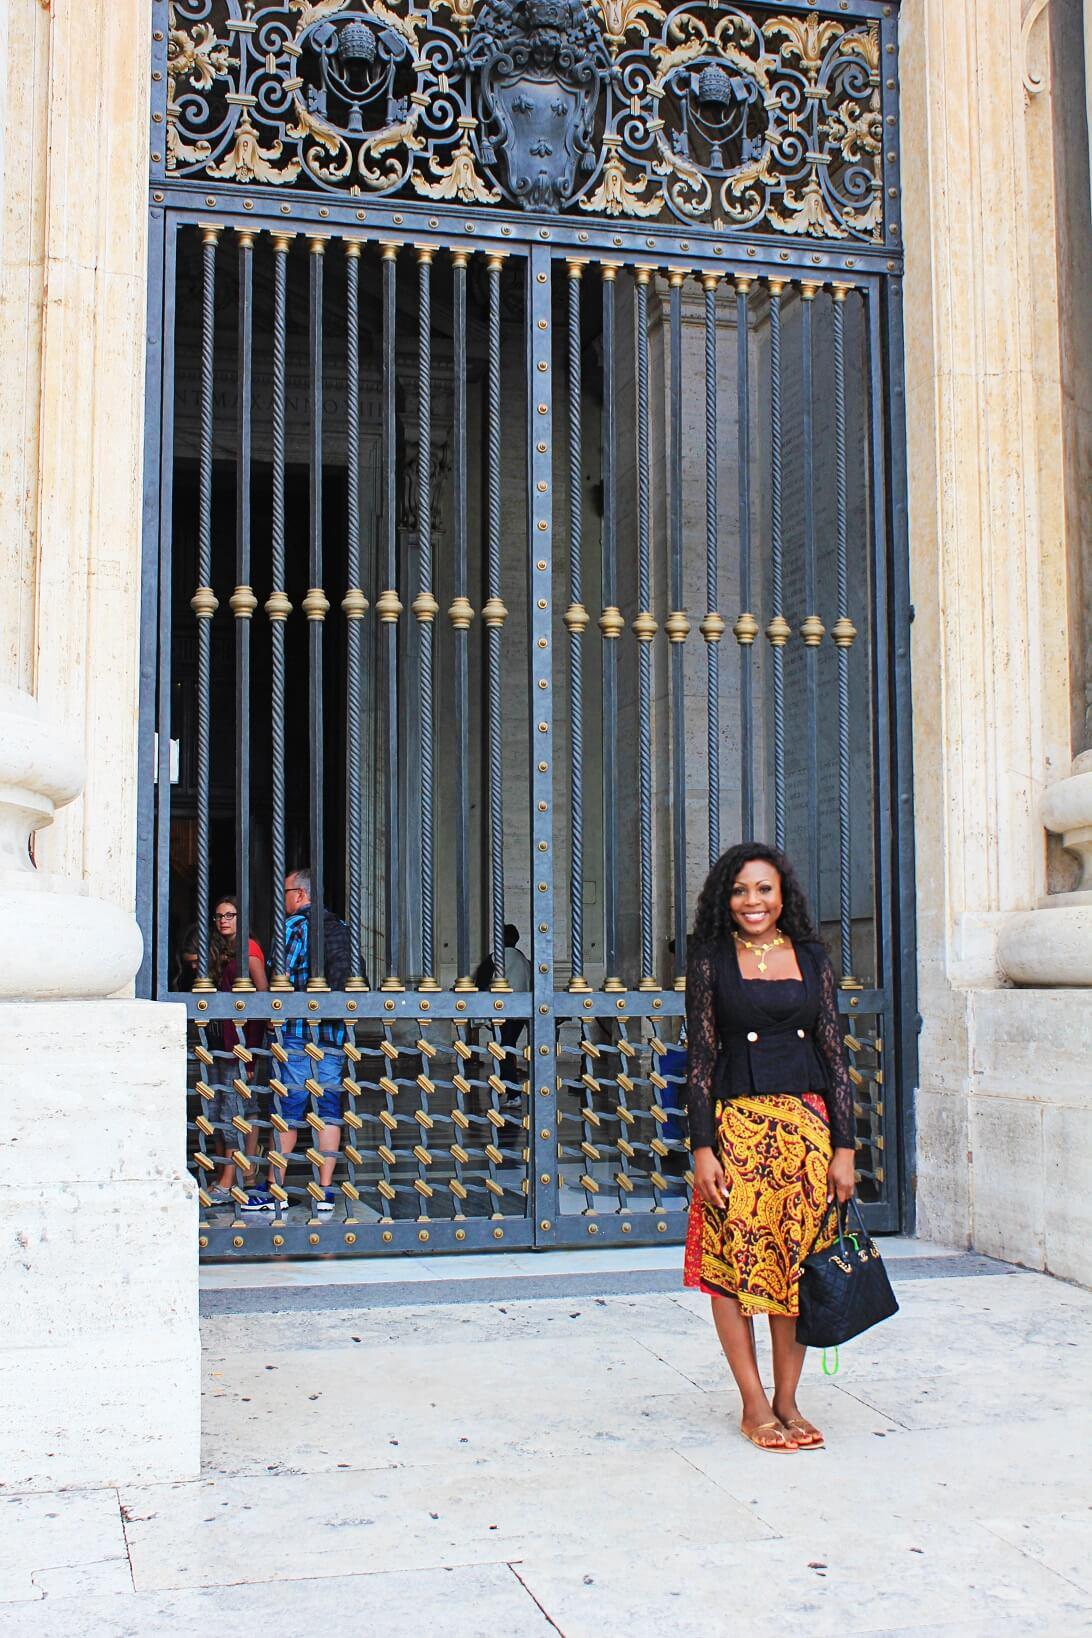 Vatican City Basilica Di San Pietro Gate